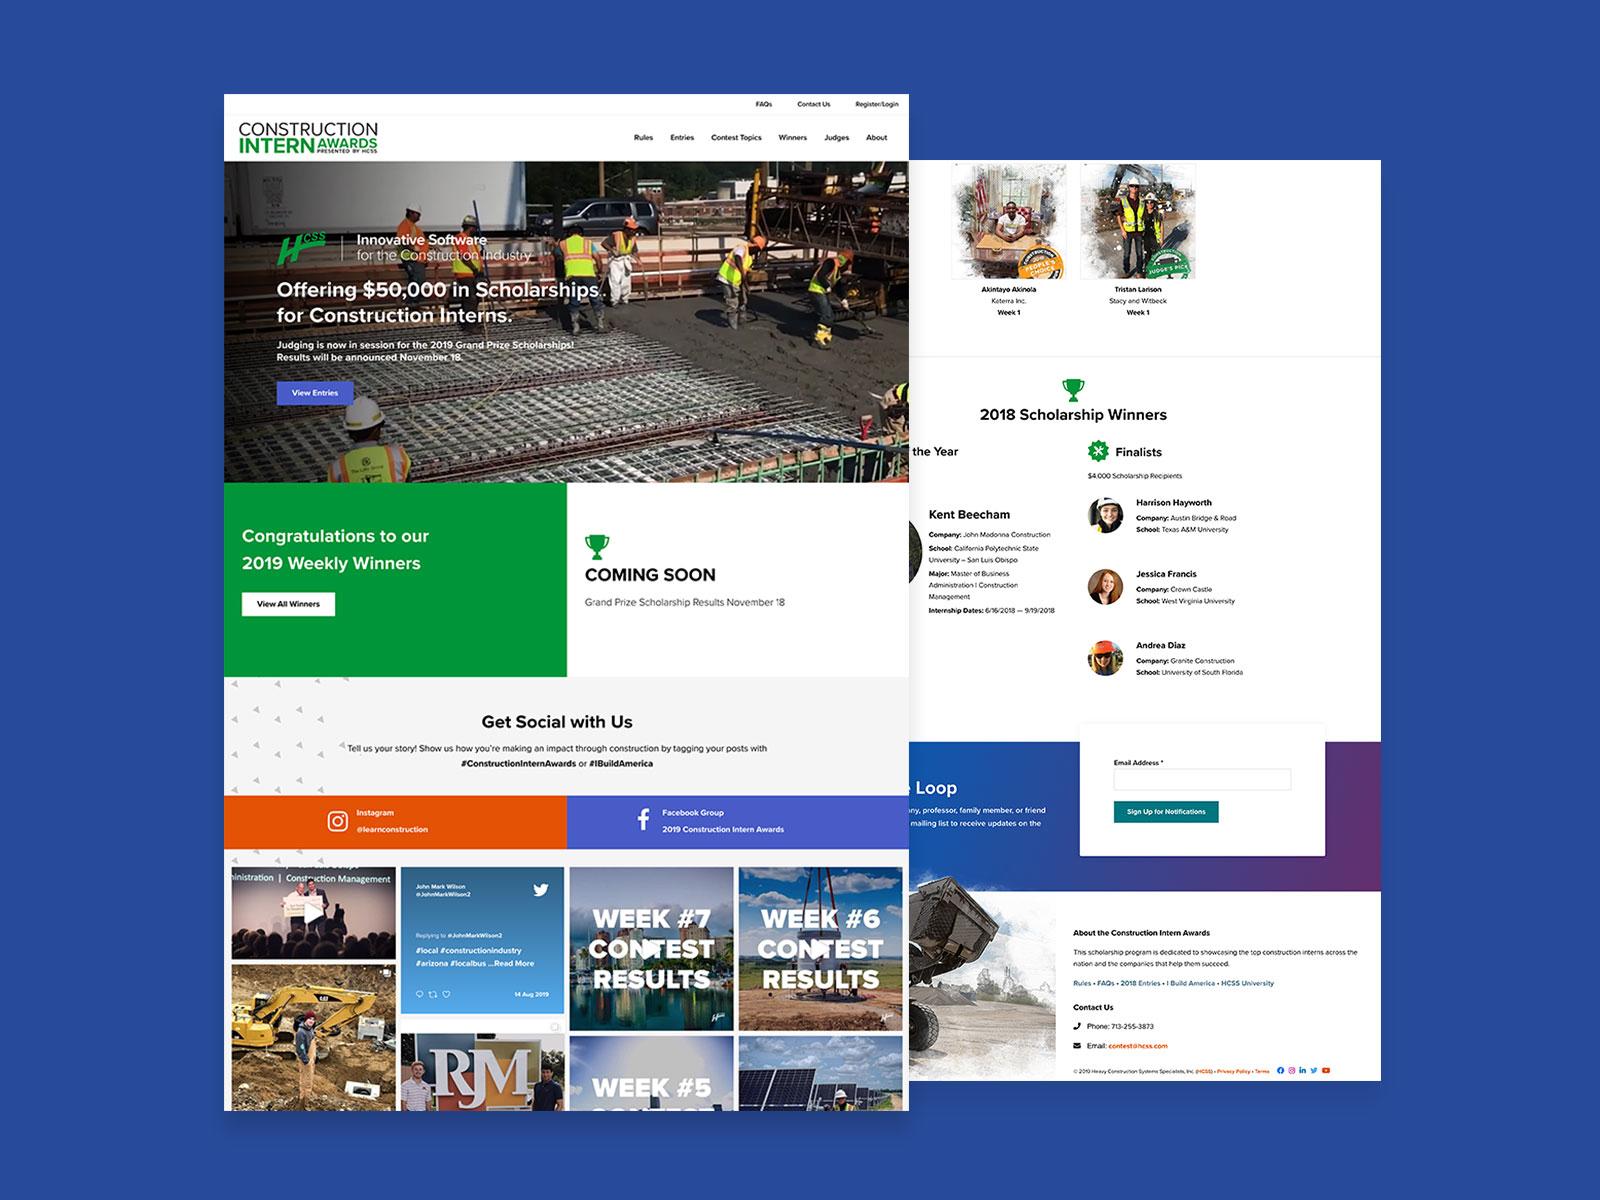 Construction Intern Awards Website Design By Vanessa Amilet Santos On Dribbble